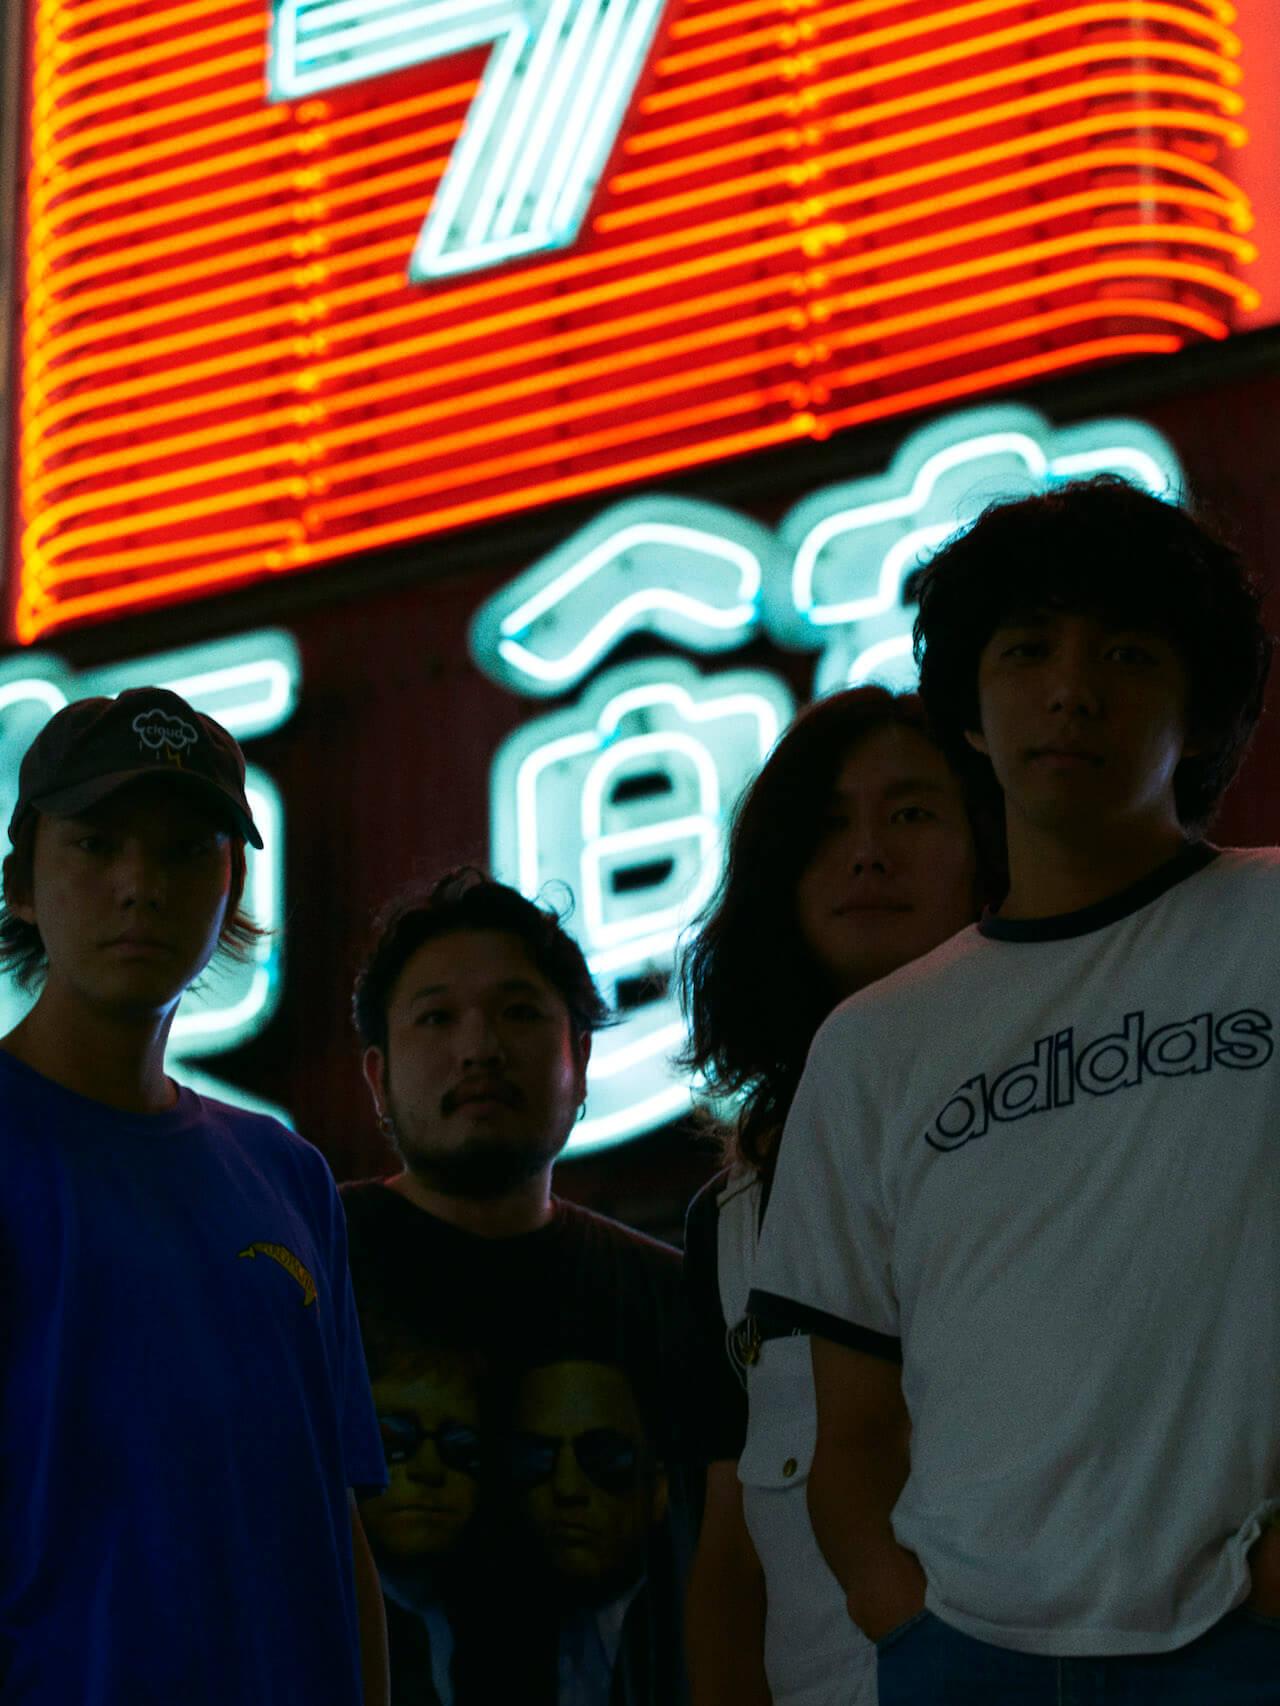 TENDOUJI×フジロック|東京オルタナシーン屈指の愛されバンドに訊く、フジロック初出演の意気込み interview190722-tendouji-5